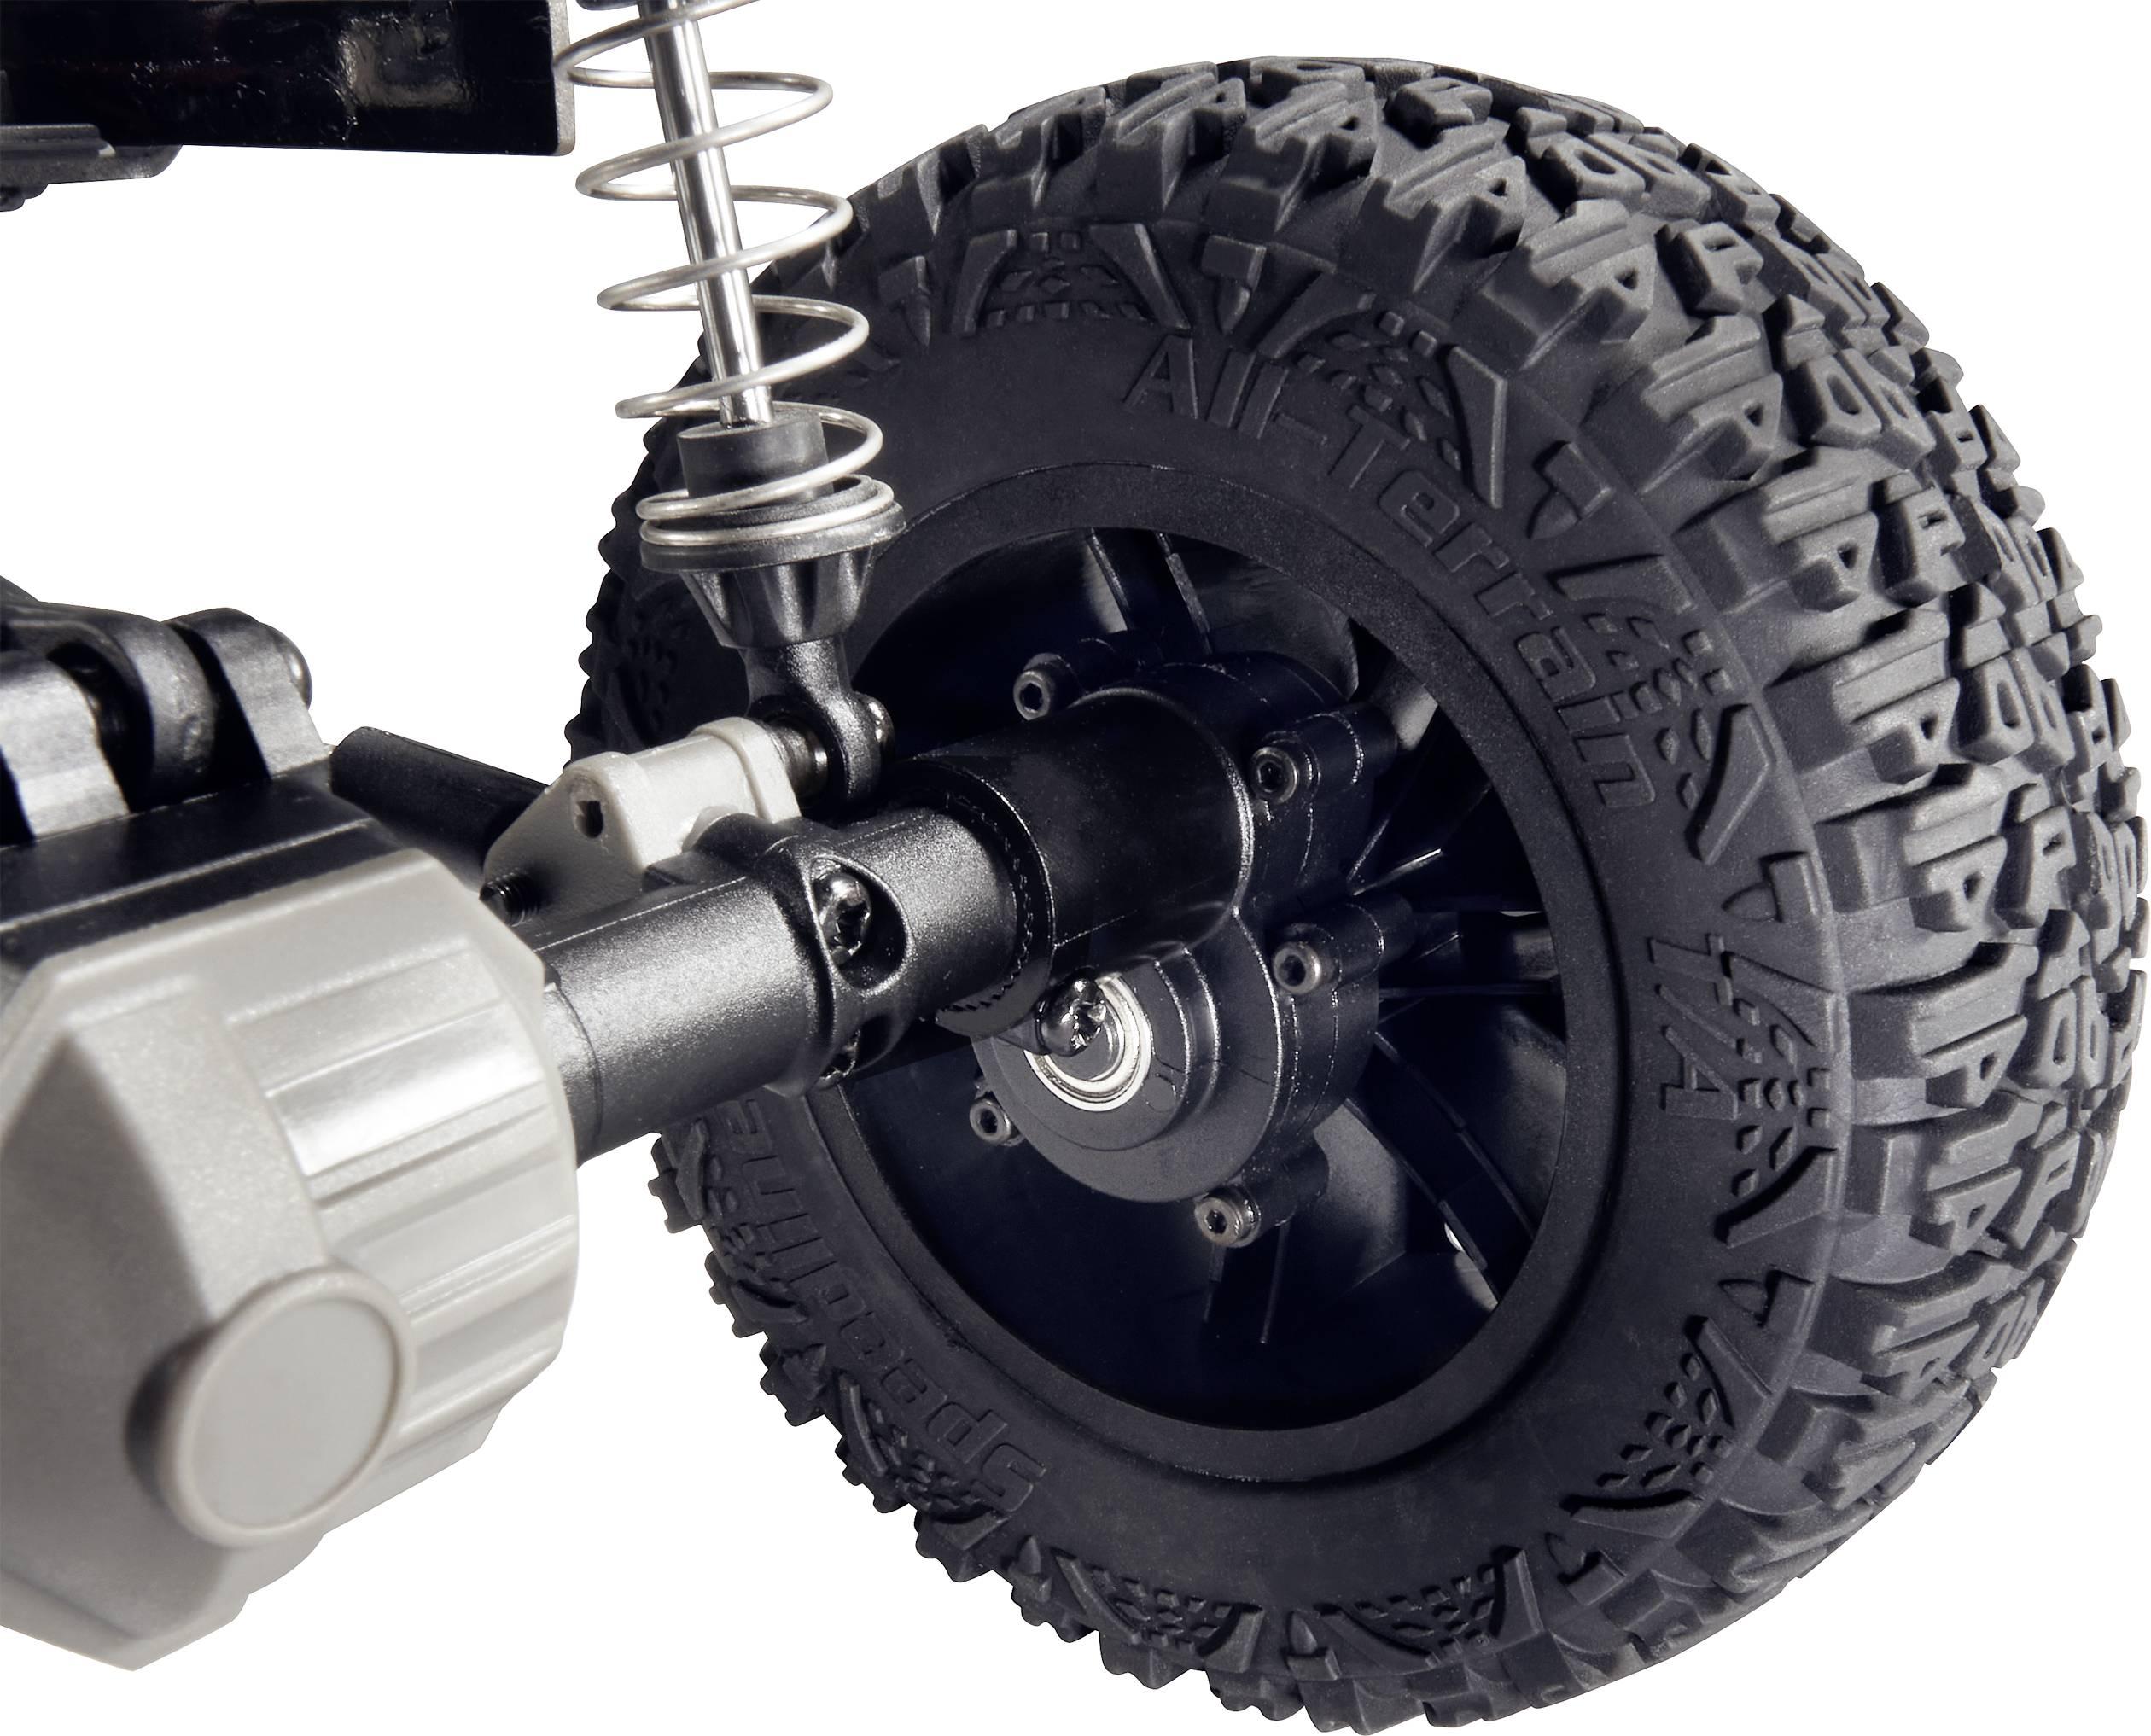 Nouveauté Reely Free men 2.0 Reely-freemen-2-0-brushed-1-10-rc-modellauto-elektro-crawler-allradantrieb-4wd-100-rtr-2-4-ghz-inkl-akku-ladegeraet